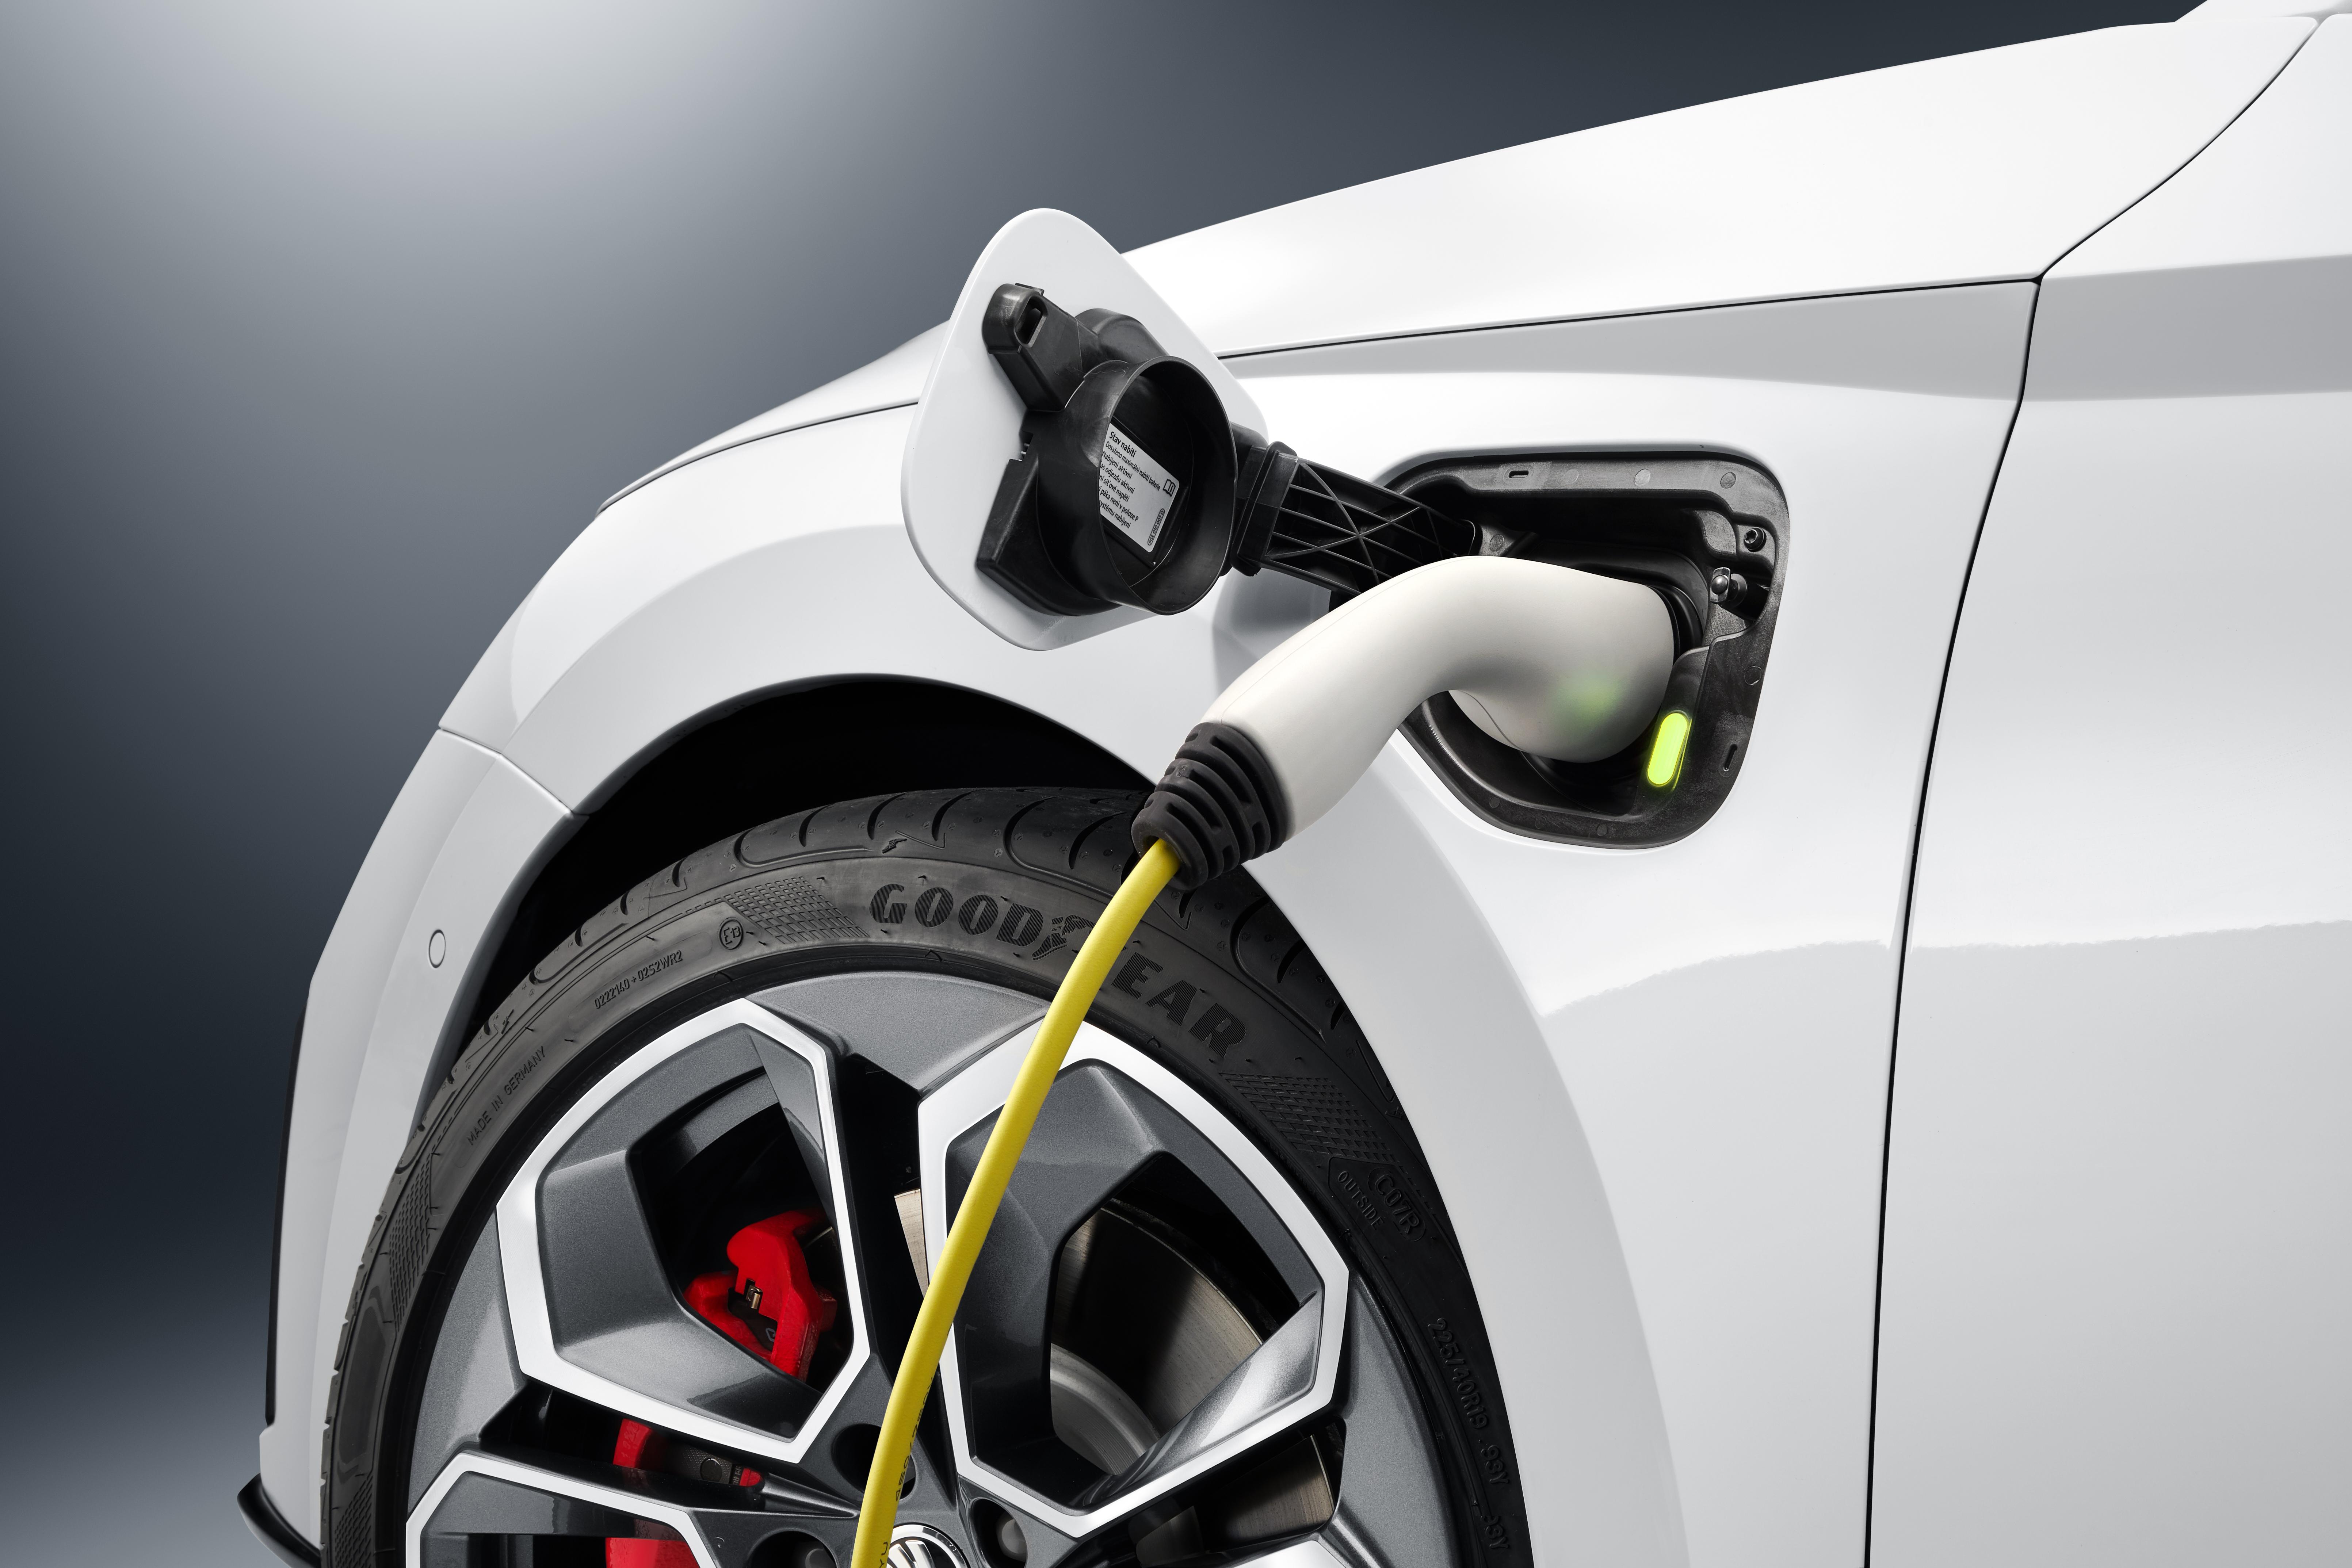 All-new OCTAVIA RS iV plug-in hybrid is the SKODA highlight at the Geneva Motor Show - Image 2